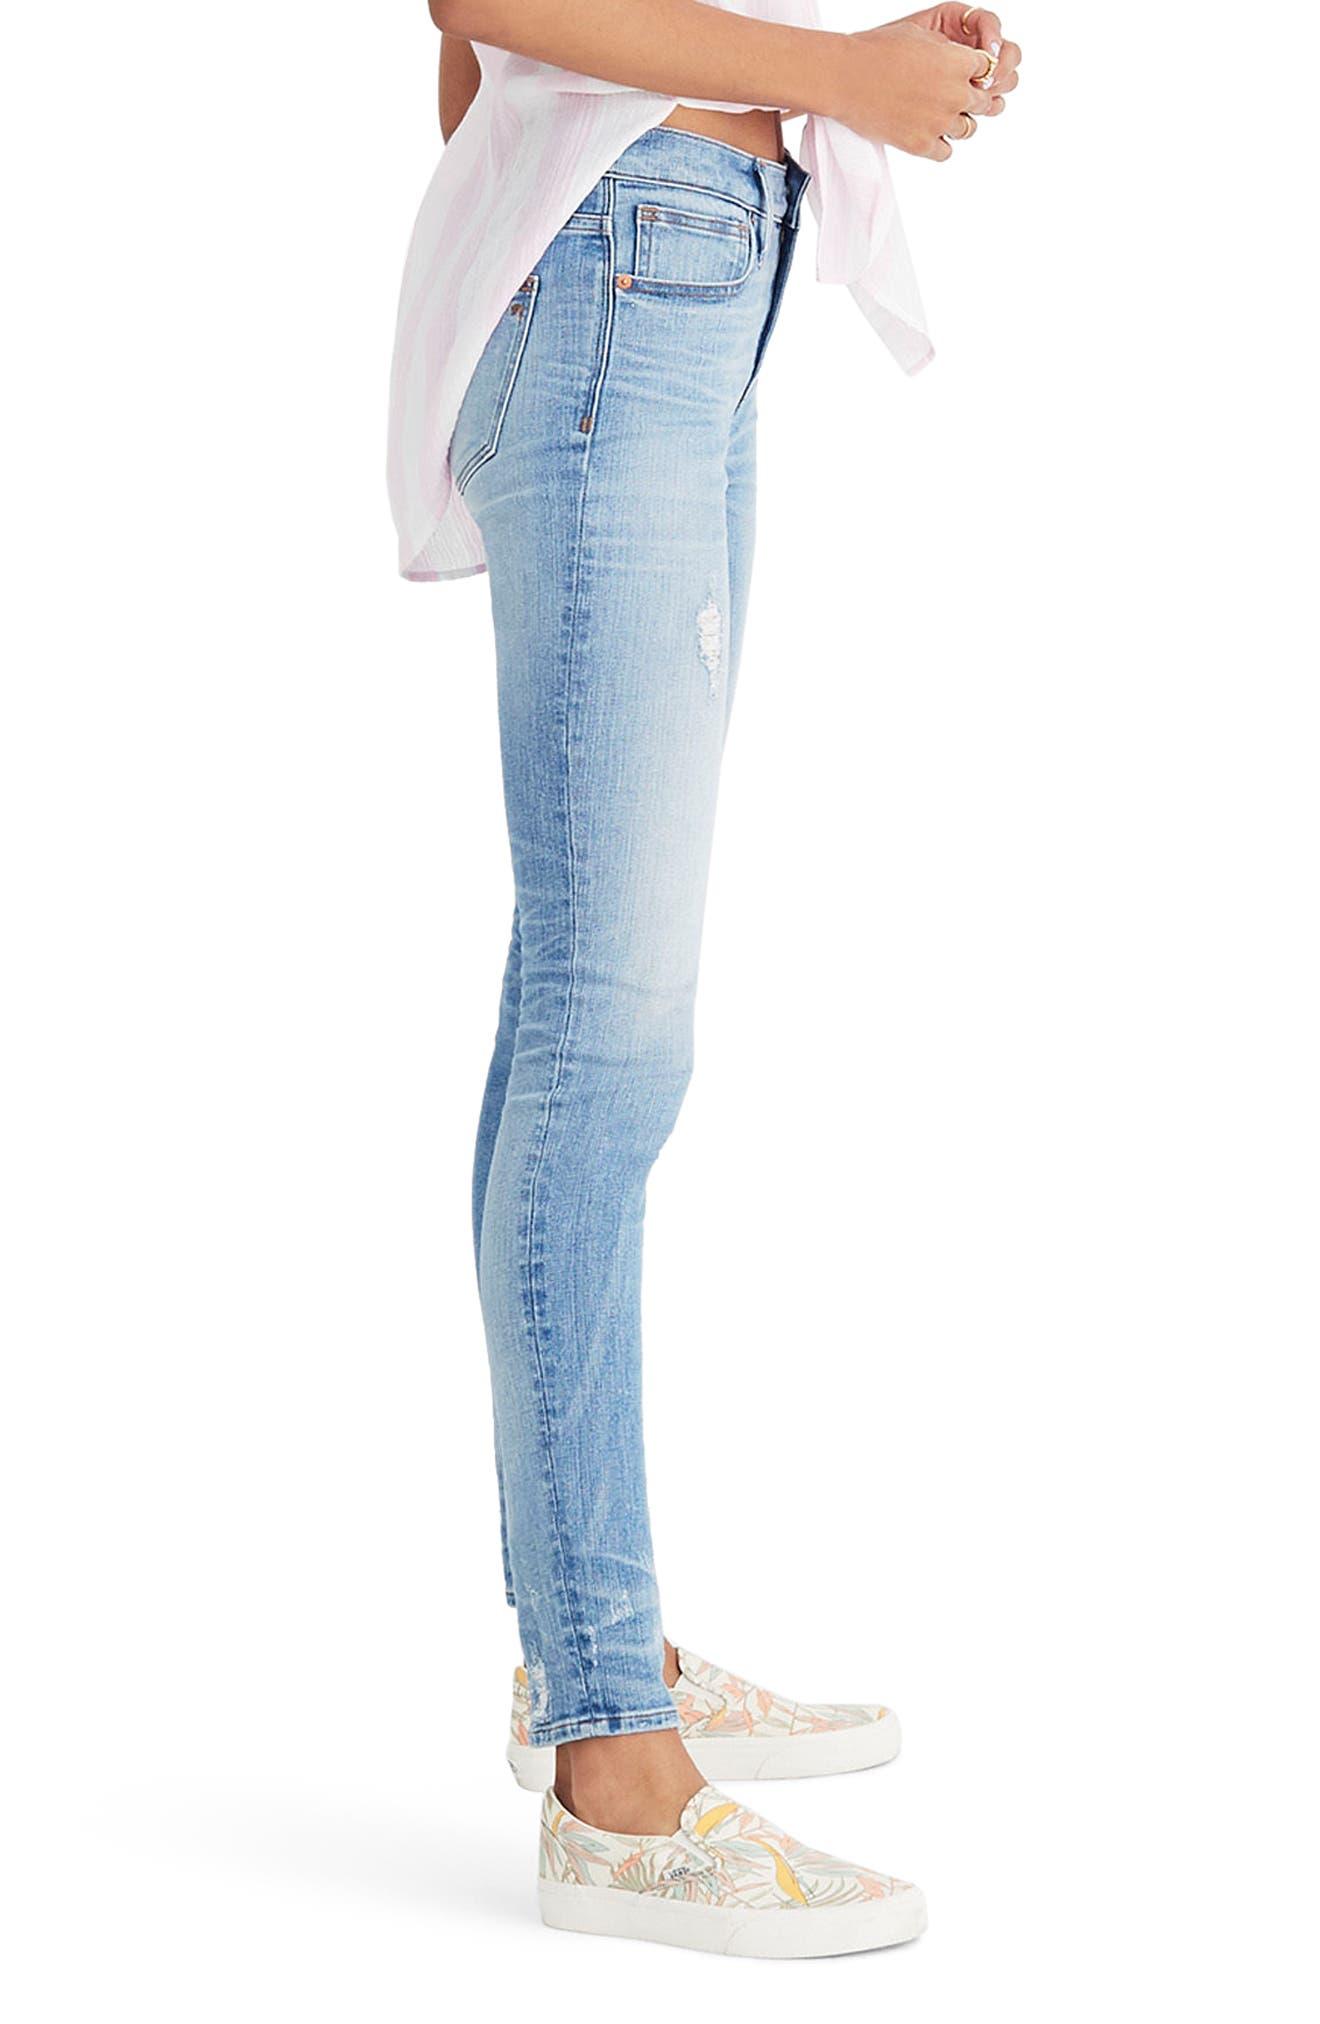 MADEWELL,                             9-Inch Destructed Hem High Waist Skinny Jeans,                             Alternate thumbnail 3, color,                             400